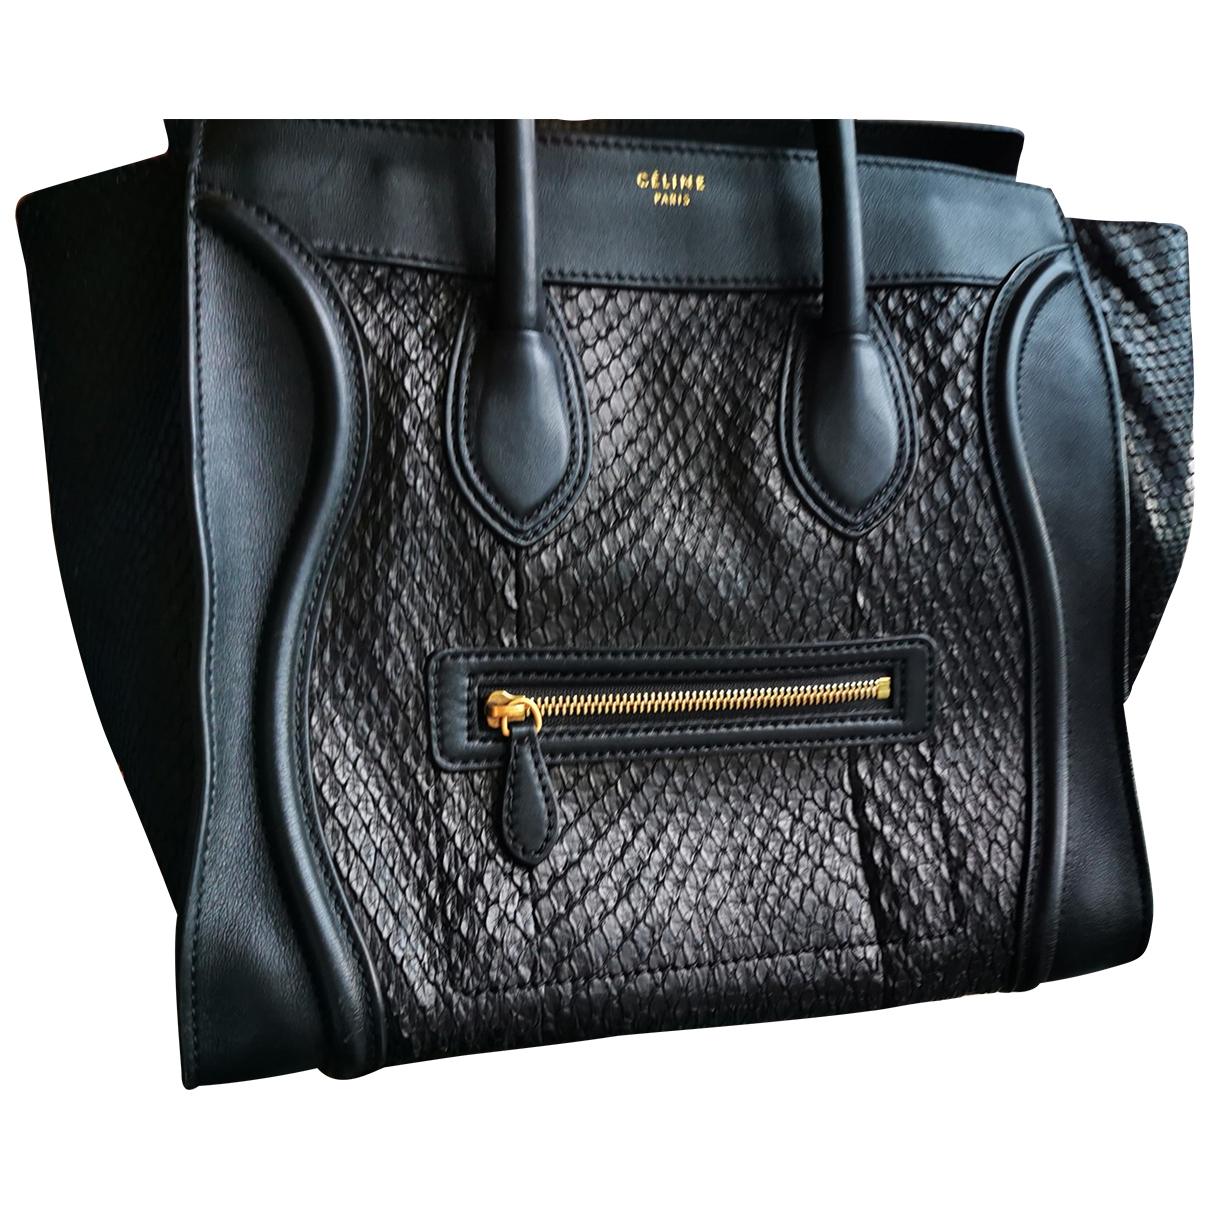 Bolso  Luggage de Piton Celine